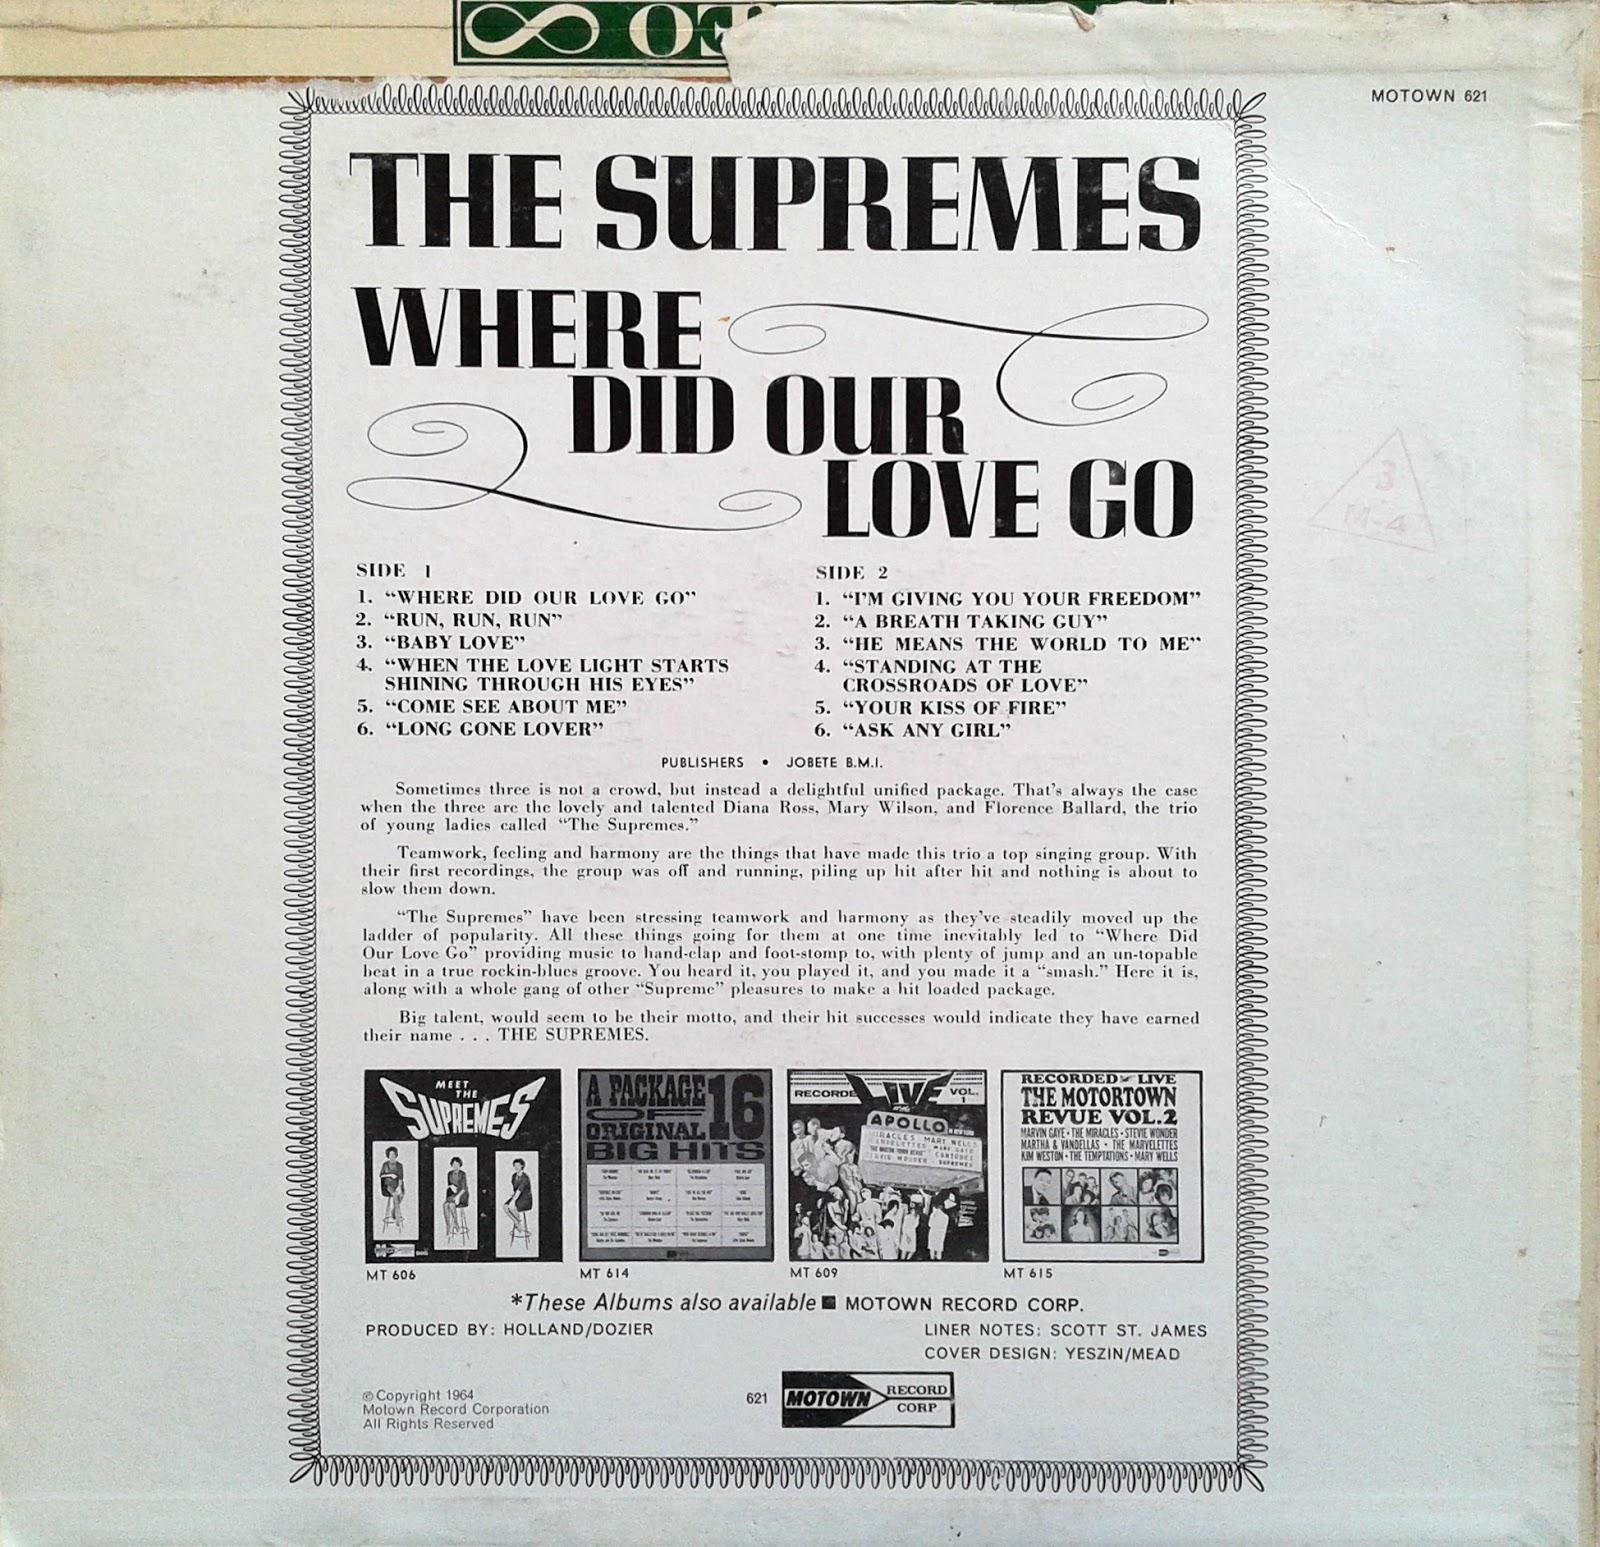 Supremes where did our love go lyrics